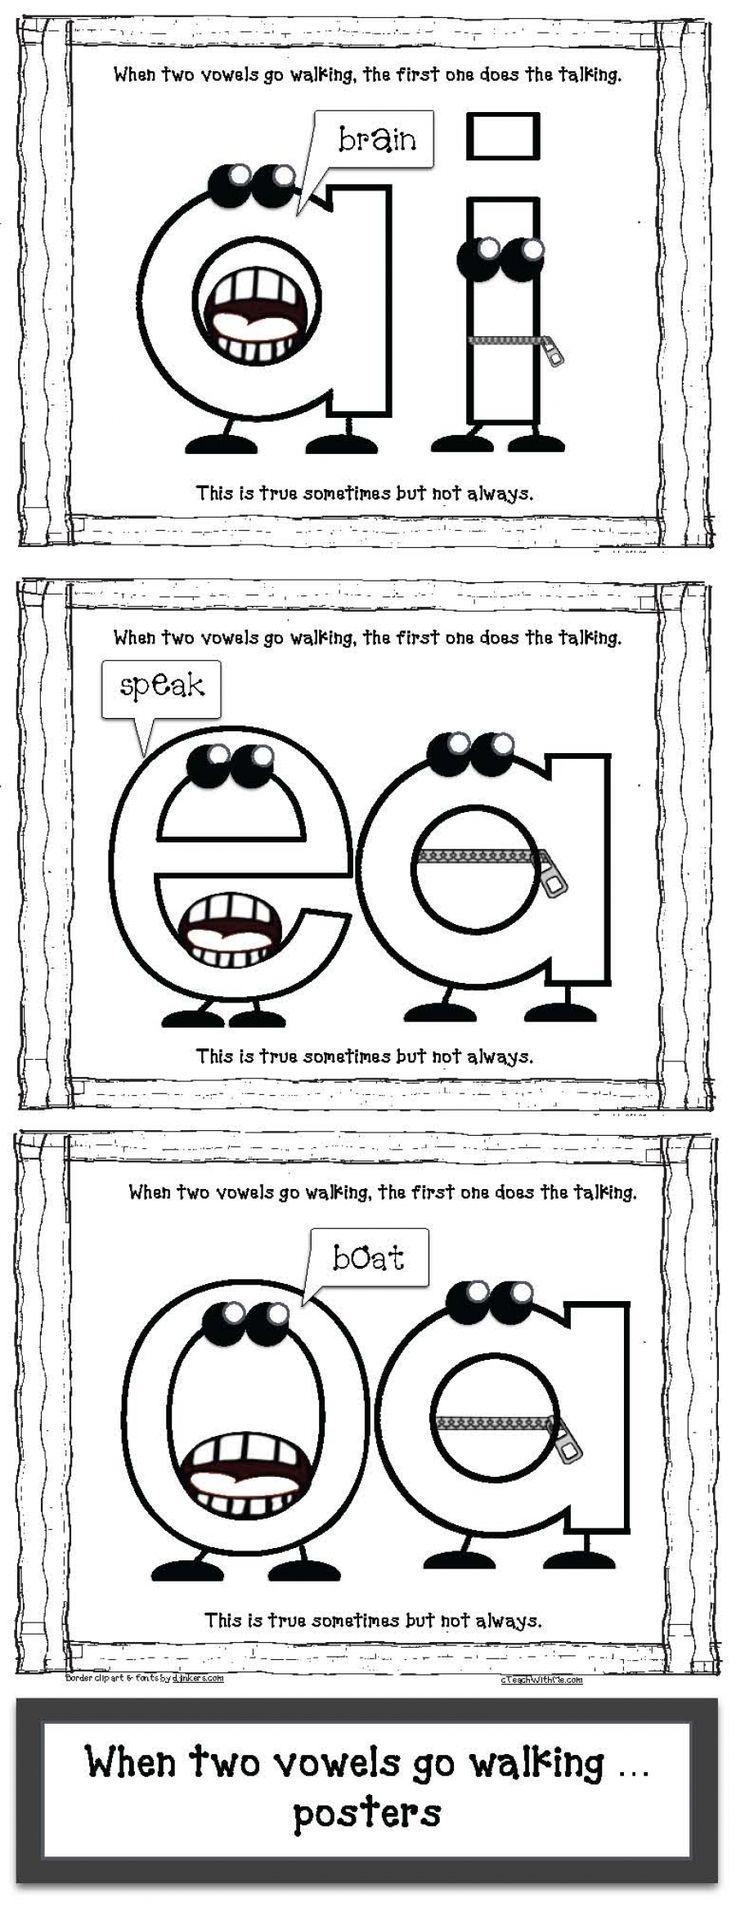 Workbooks long vowel digraphs worksheets : Best 25+ Teaching vowels ideas on Pinterest | Vowel sounds, Long ...